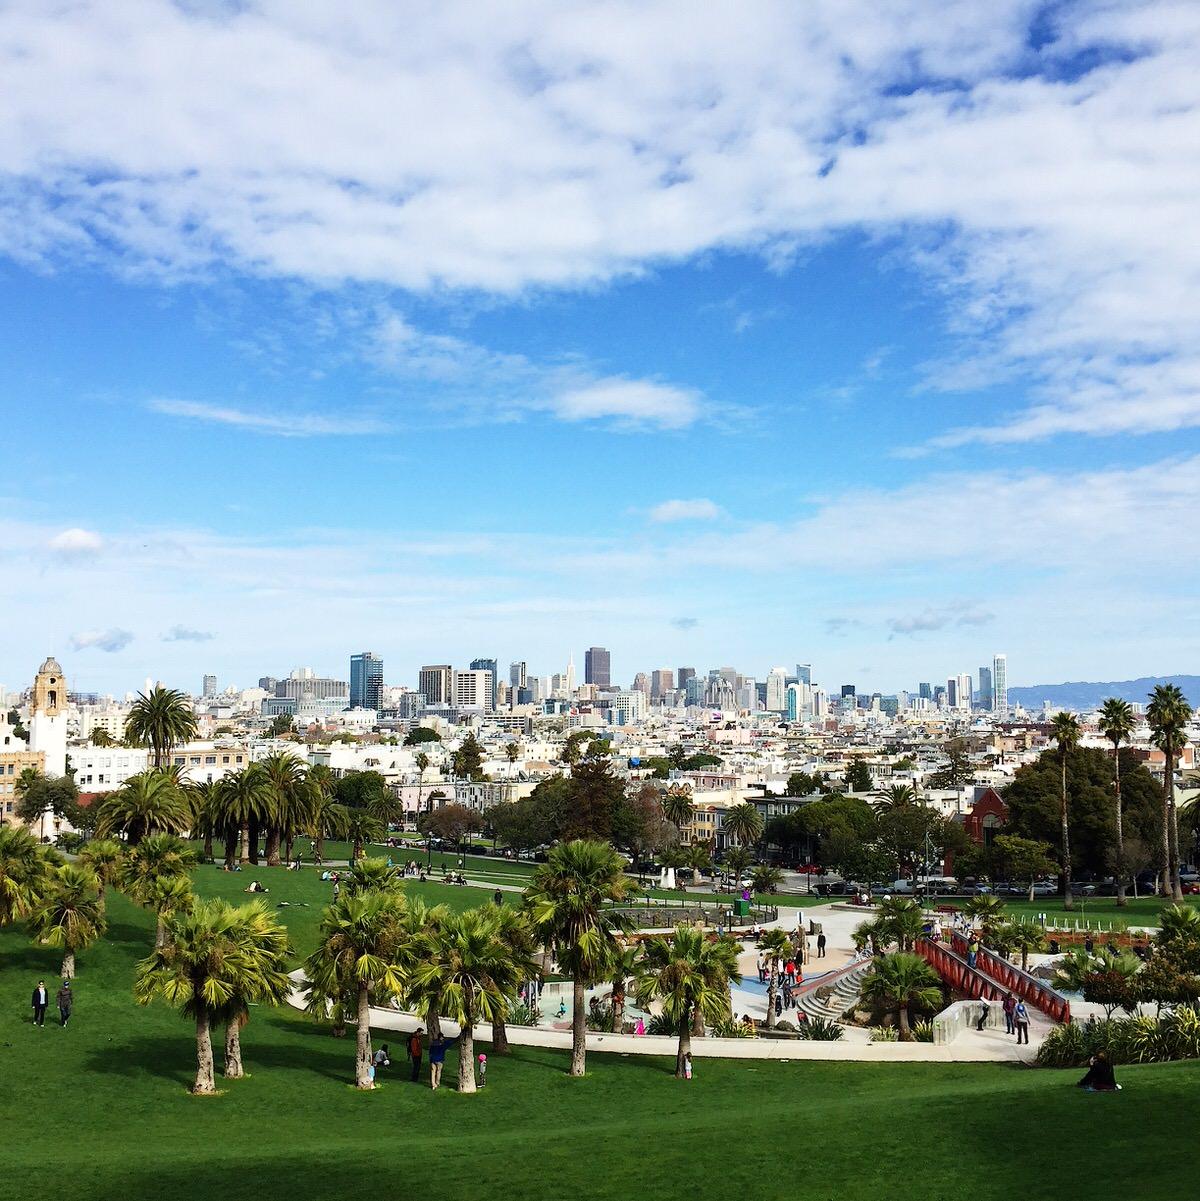 Dolores Park, San Francisco, CA